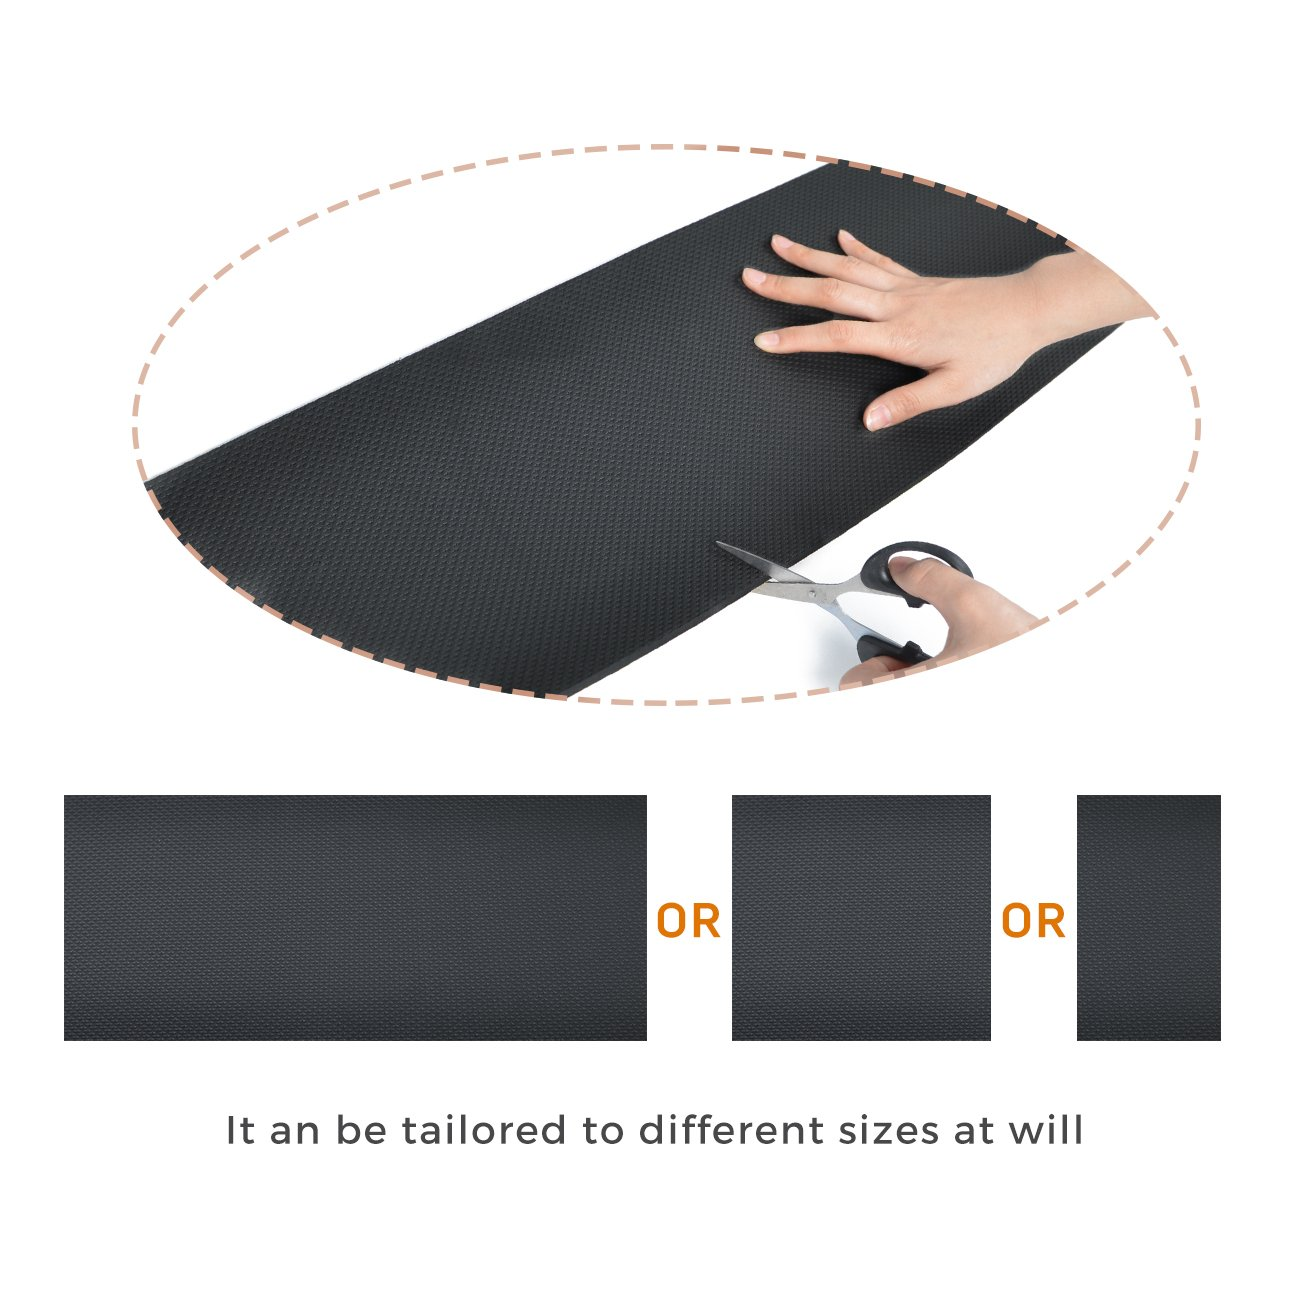 Retracting Stop Ballg HQAP Waterproof Garage Wall Protector Car Door Protector 2 Pack 1//4 Thickness Gift